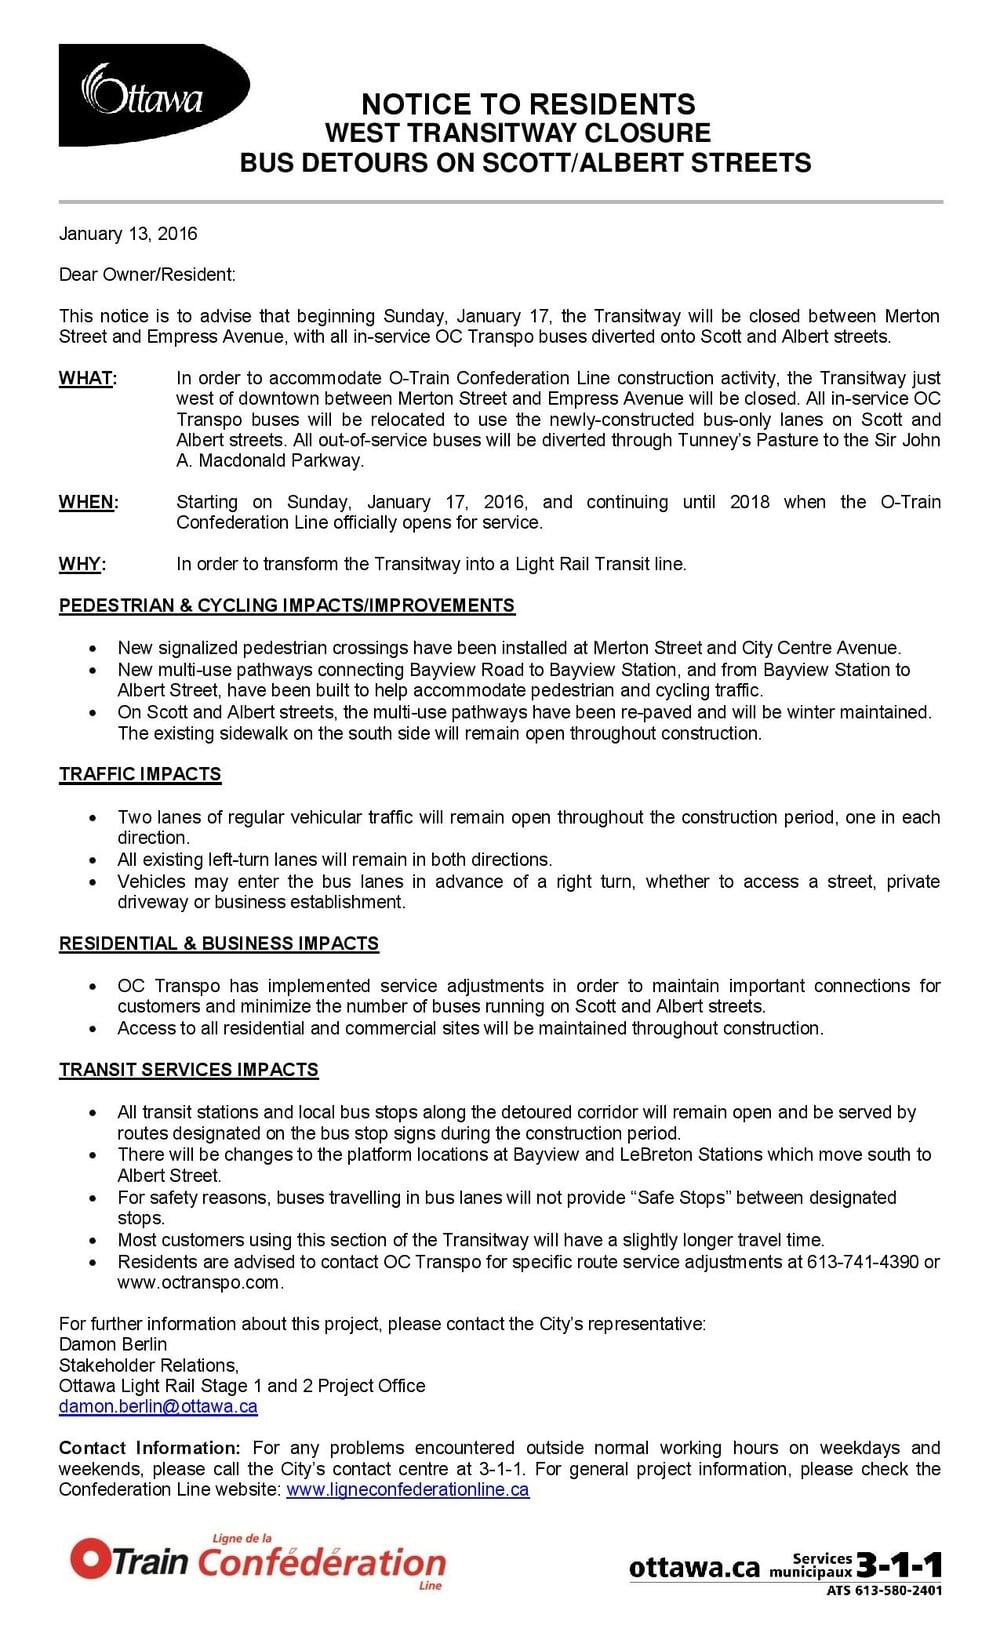 FINAL-West transitway closure-page-001.jpg